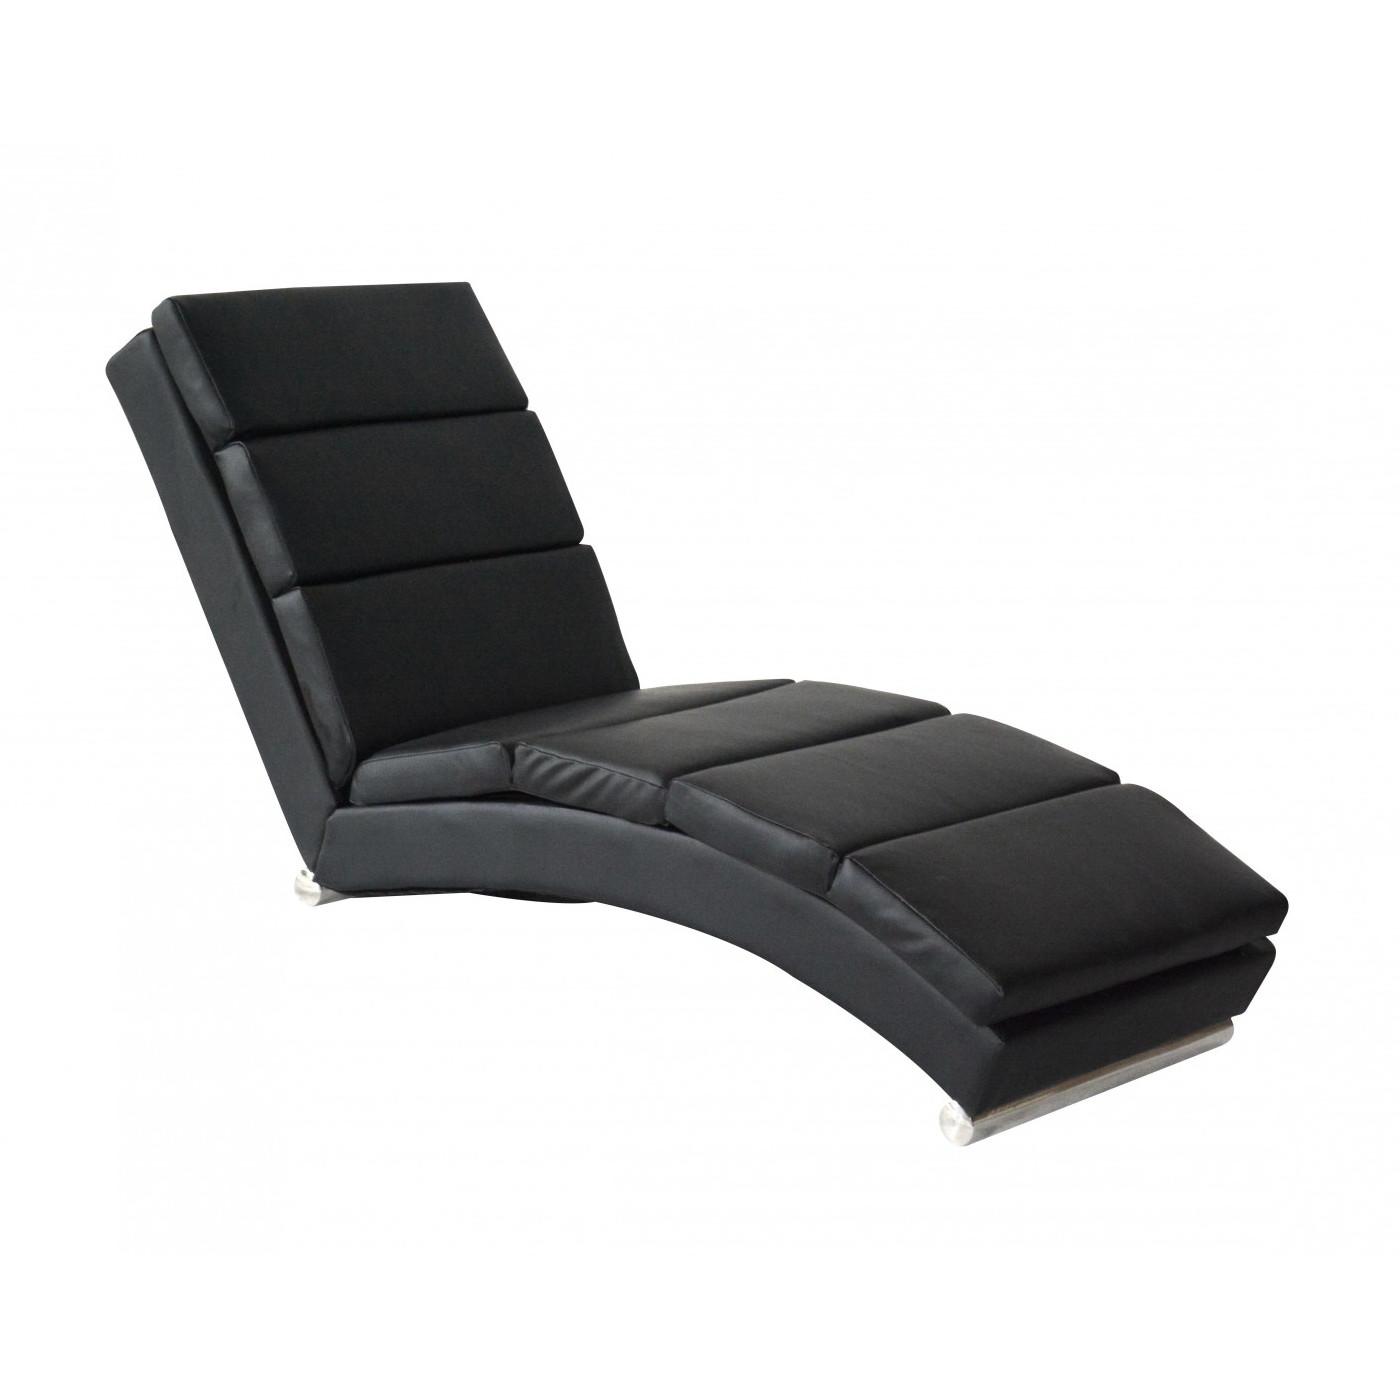 Chaiselounge relaxsessel schwarz for Relaxsessel schwarz